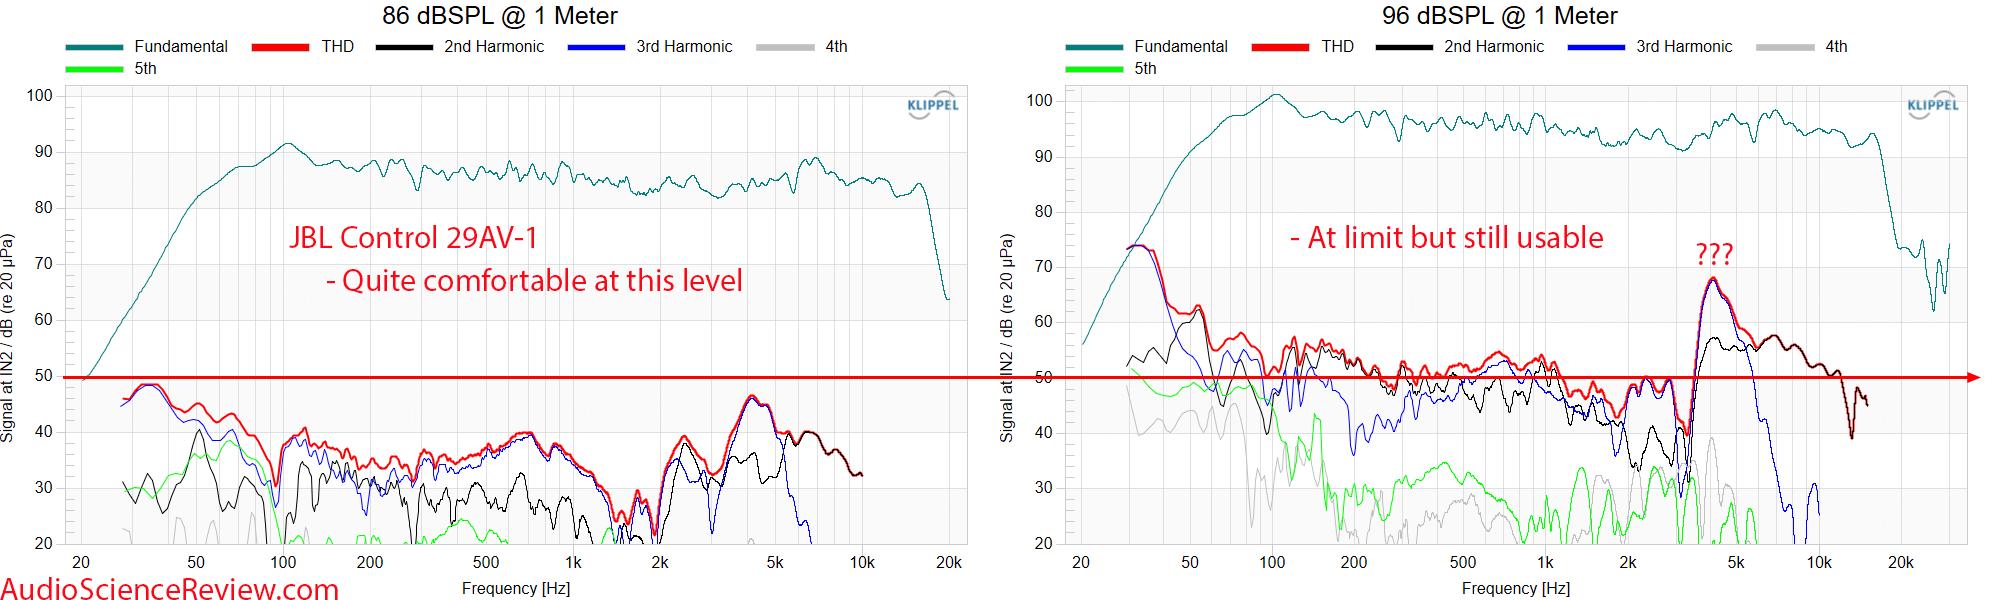 JBL Control 29AV-1 Measurements THD distortion vs frequency response Outdoor PA Speaker.png